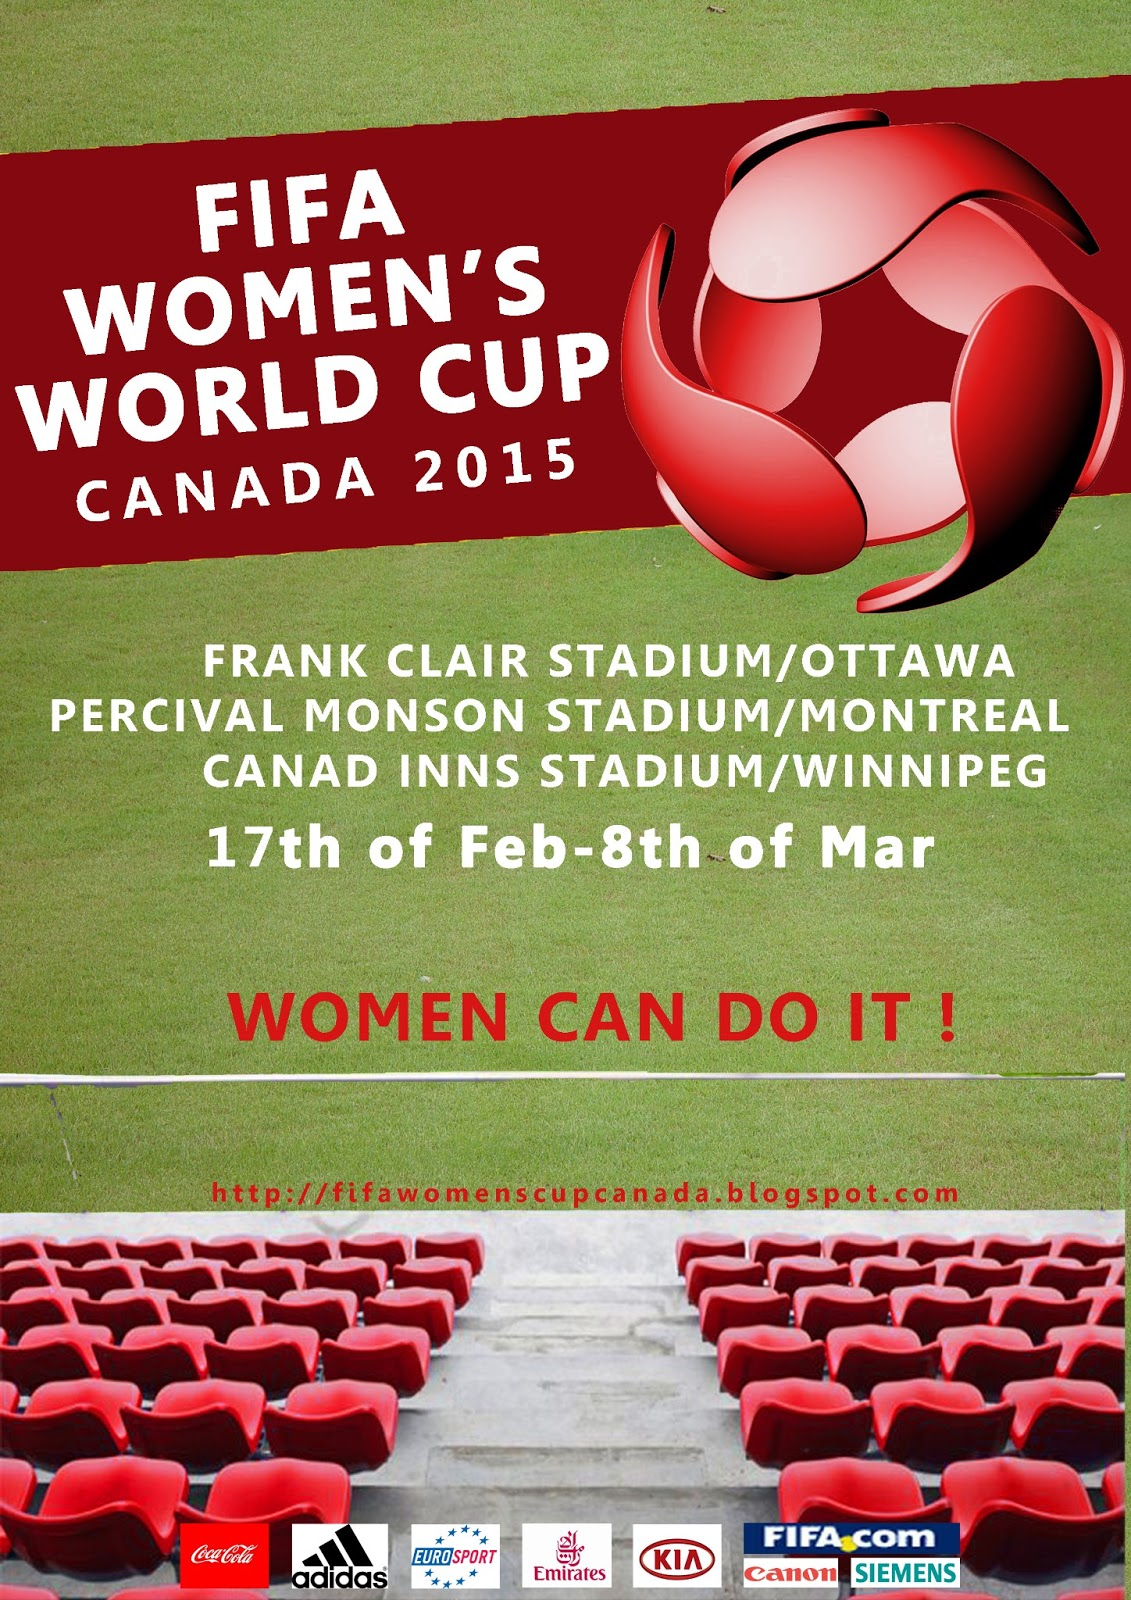 Fifa womens world cup canada 2015 logo bet365 mobil poker bet365